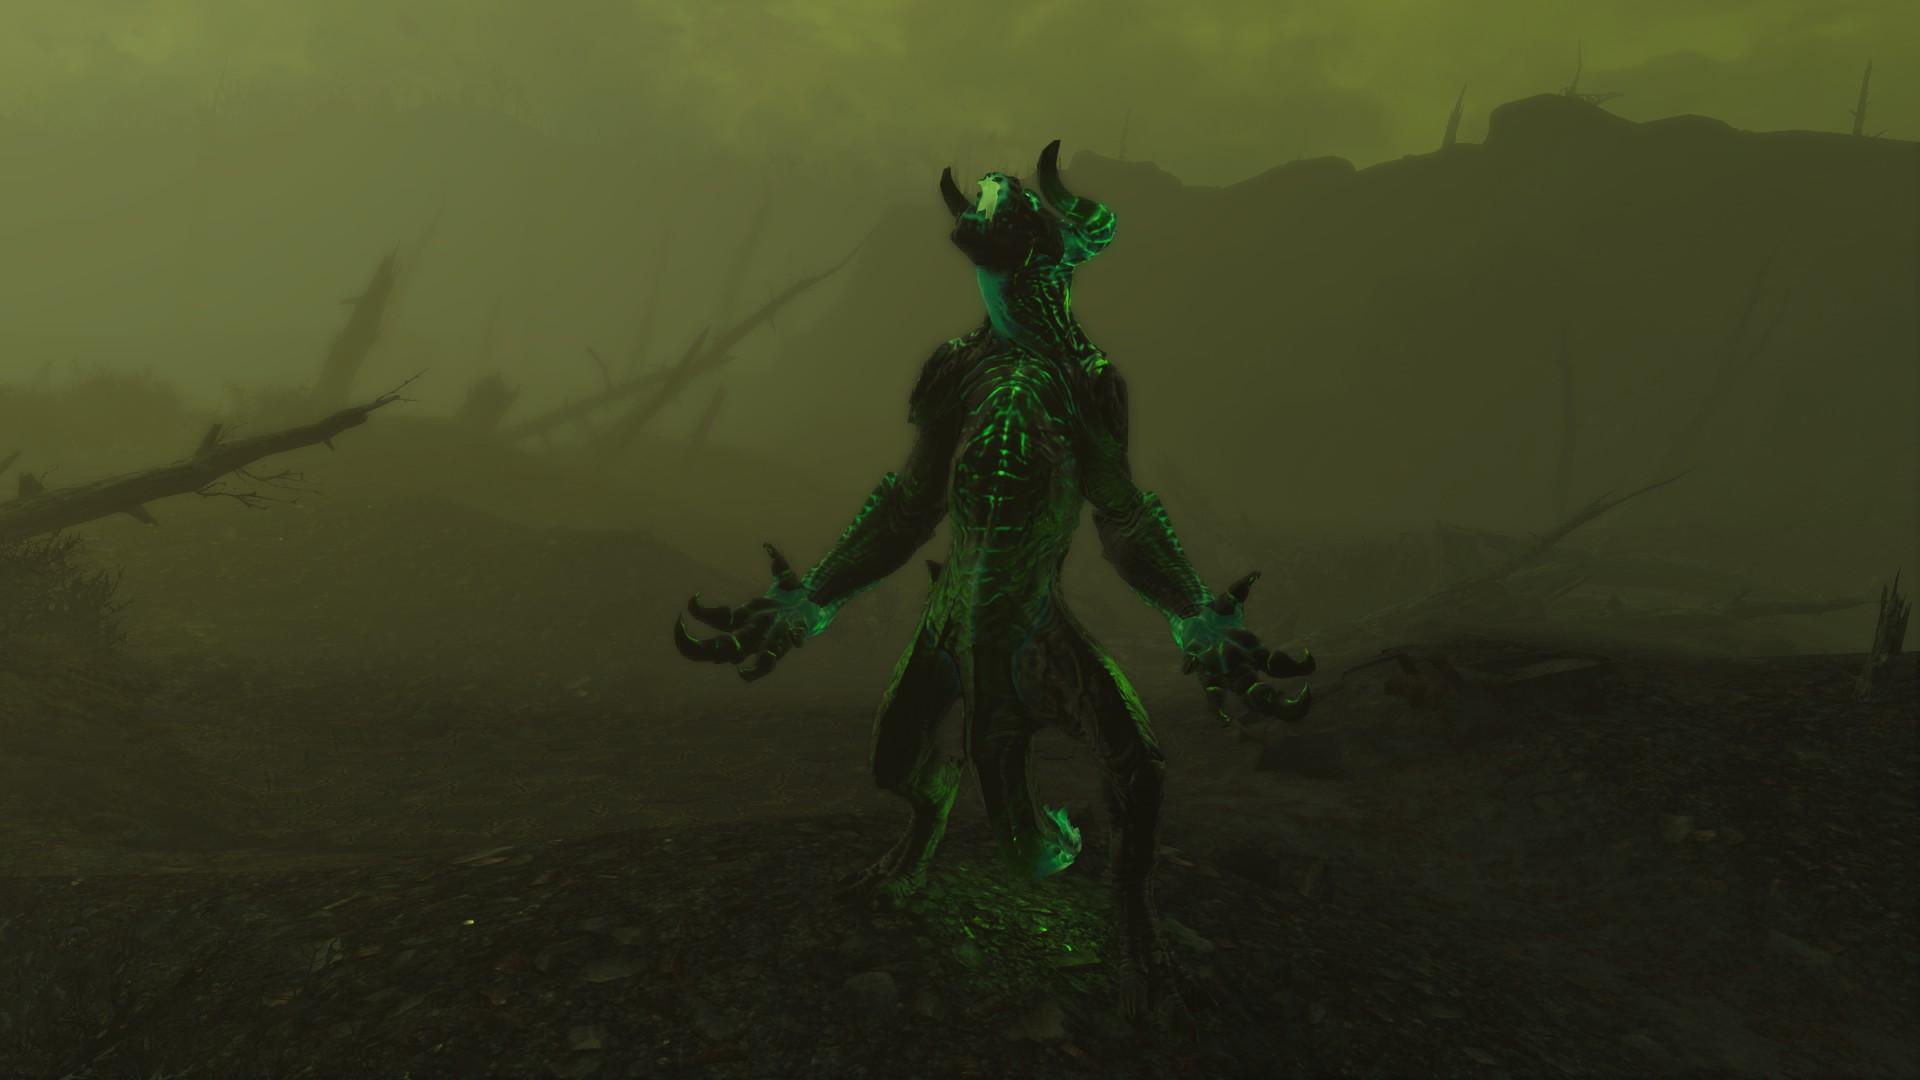 FO4 Glowing Deathclaw Roar.jpg